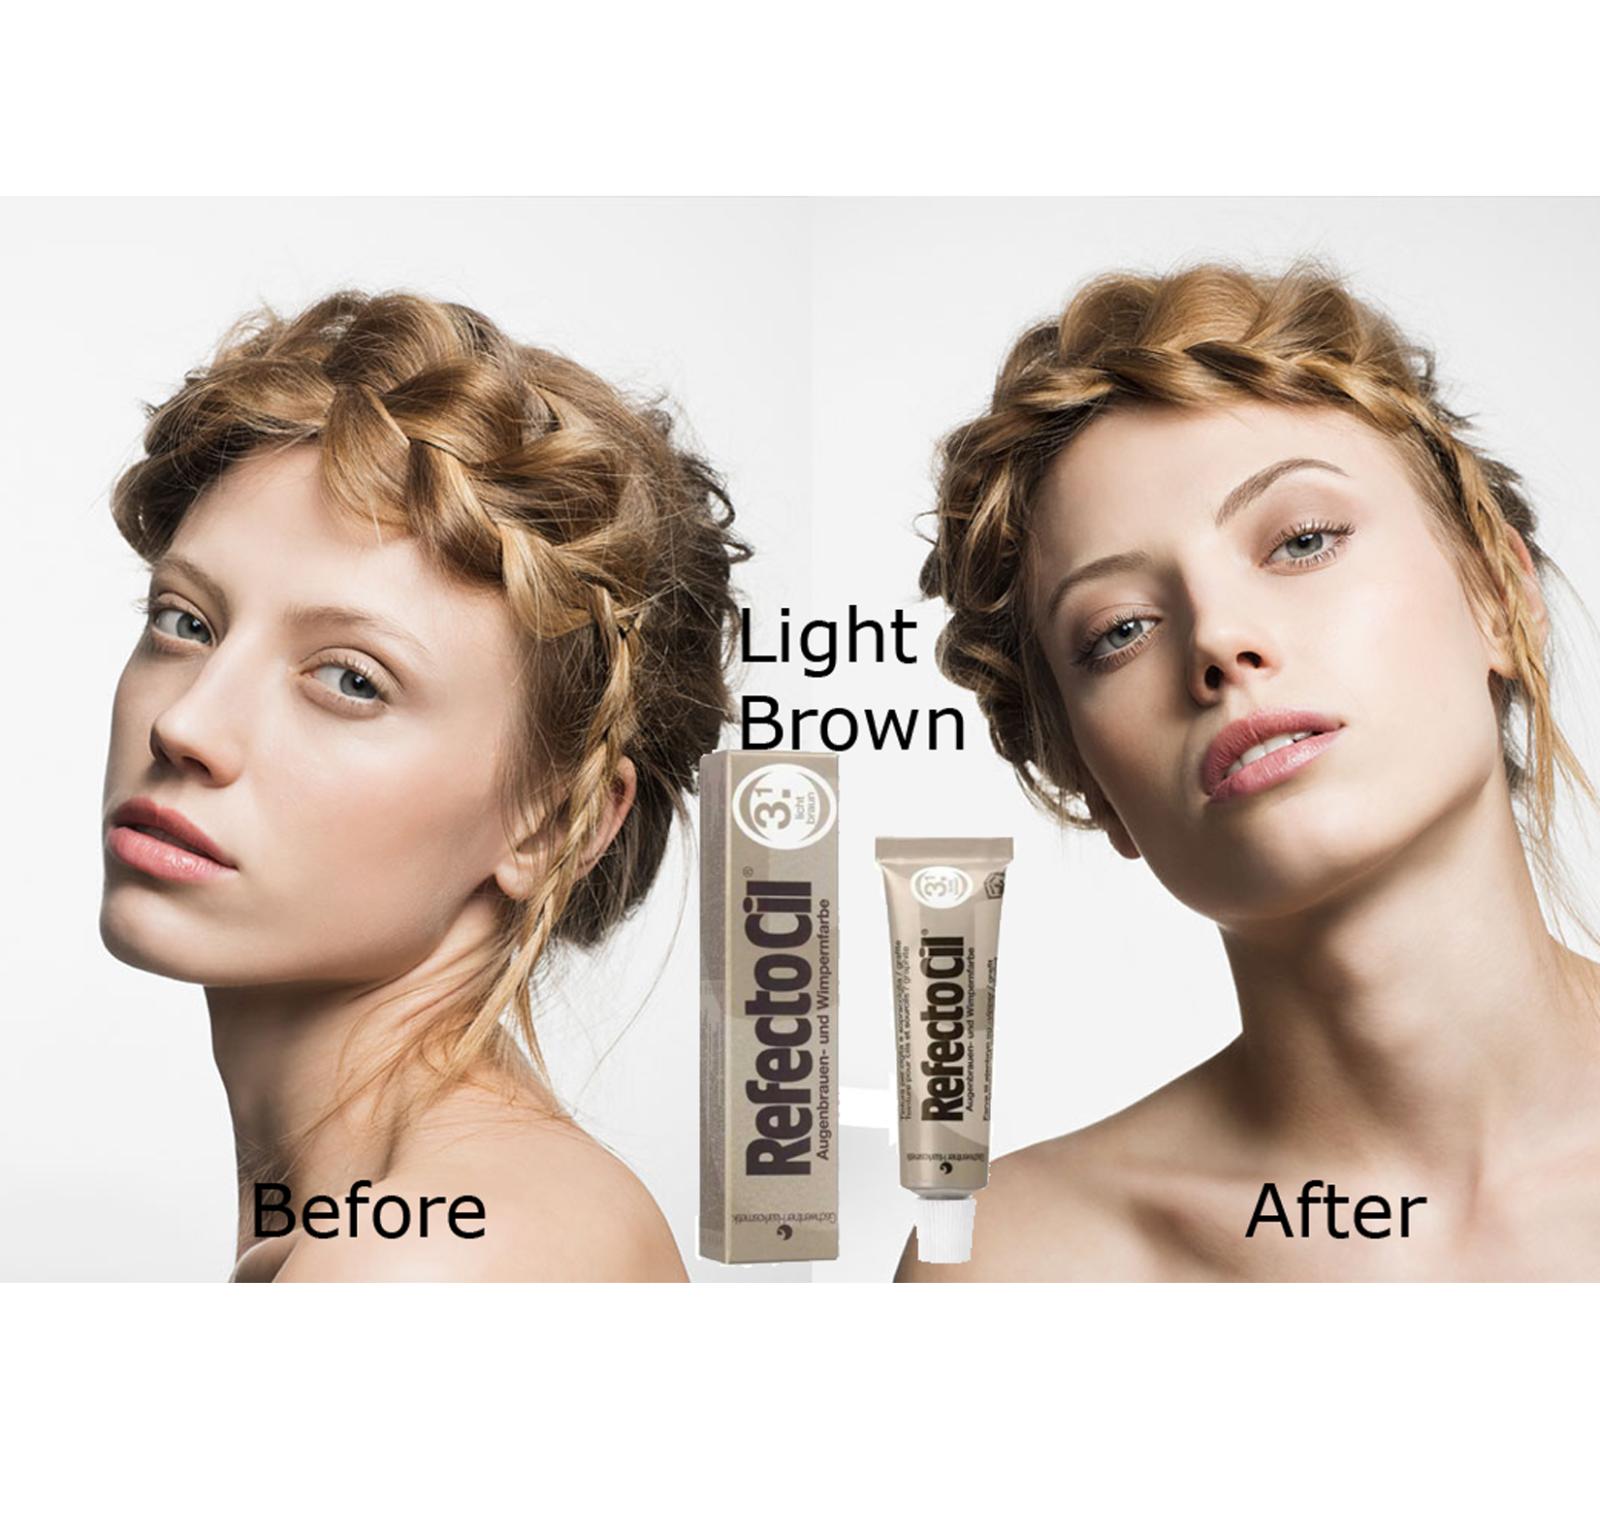 RefectoCil Eyebrow Tint Black Natural Brown Eyelash Tinting Dye Henna 15ml 7